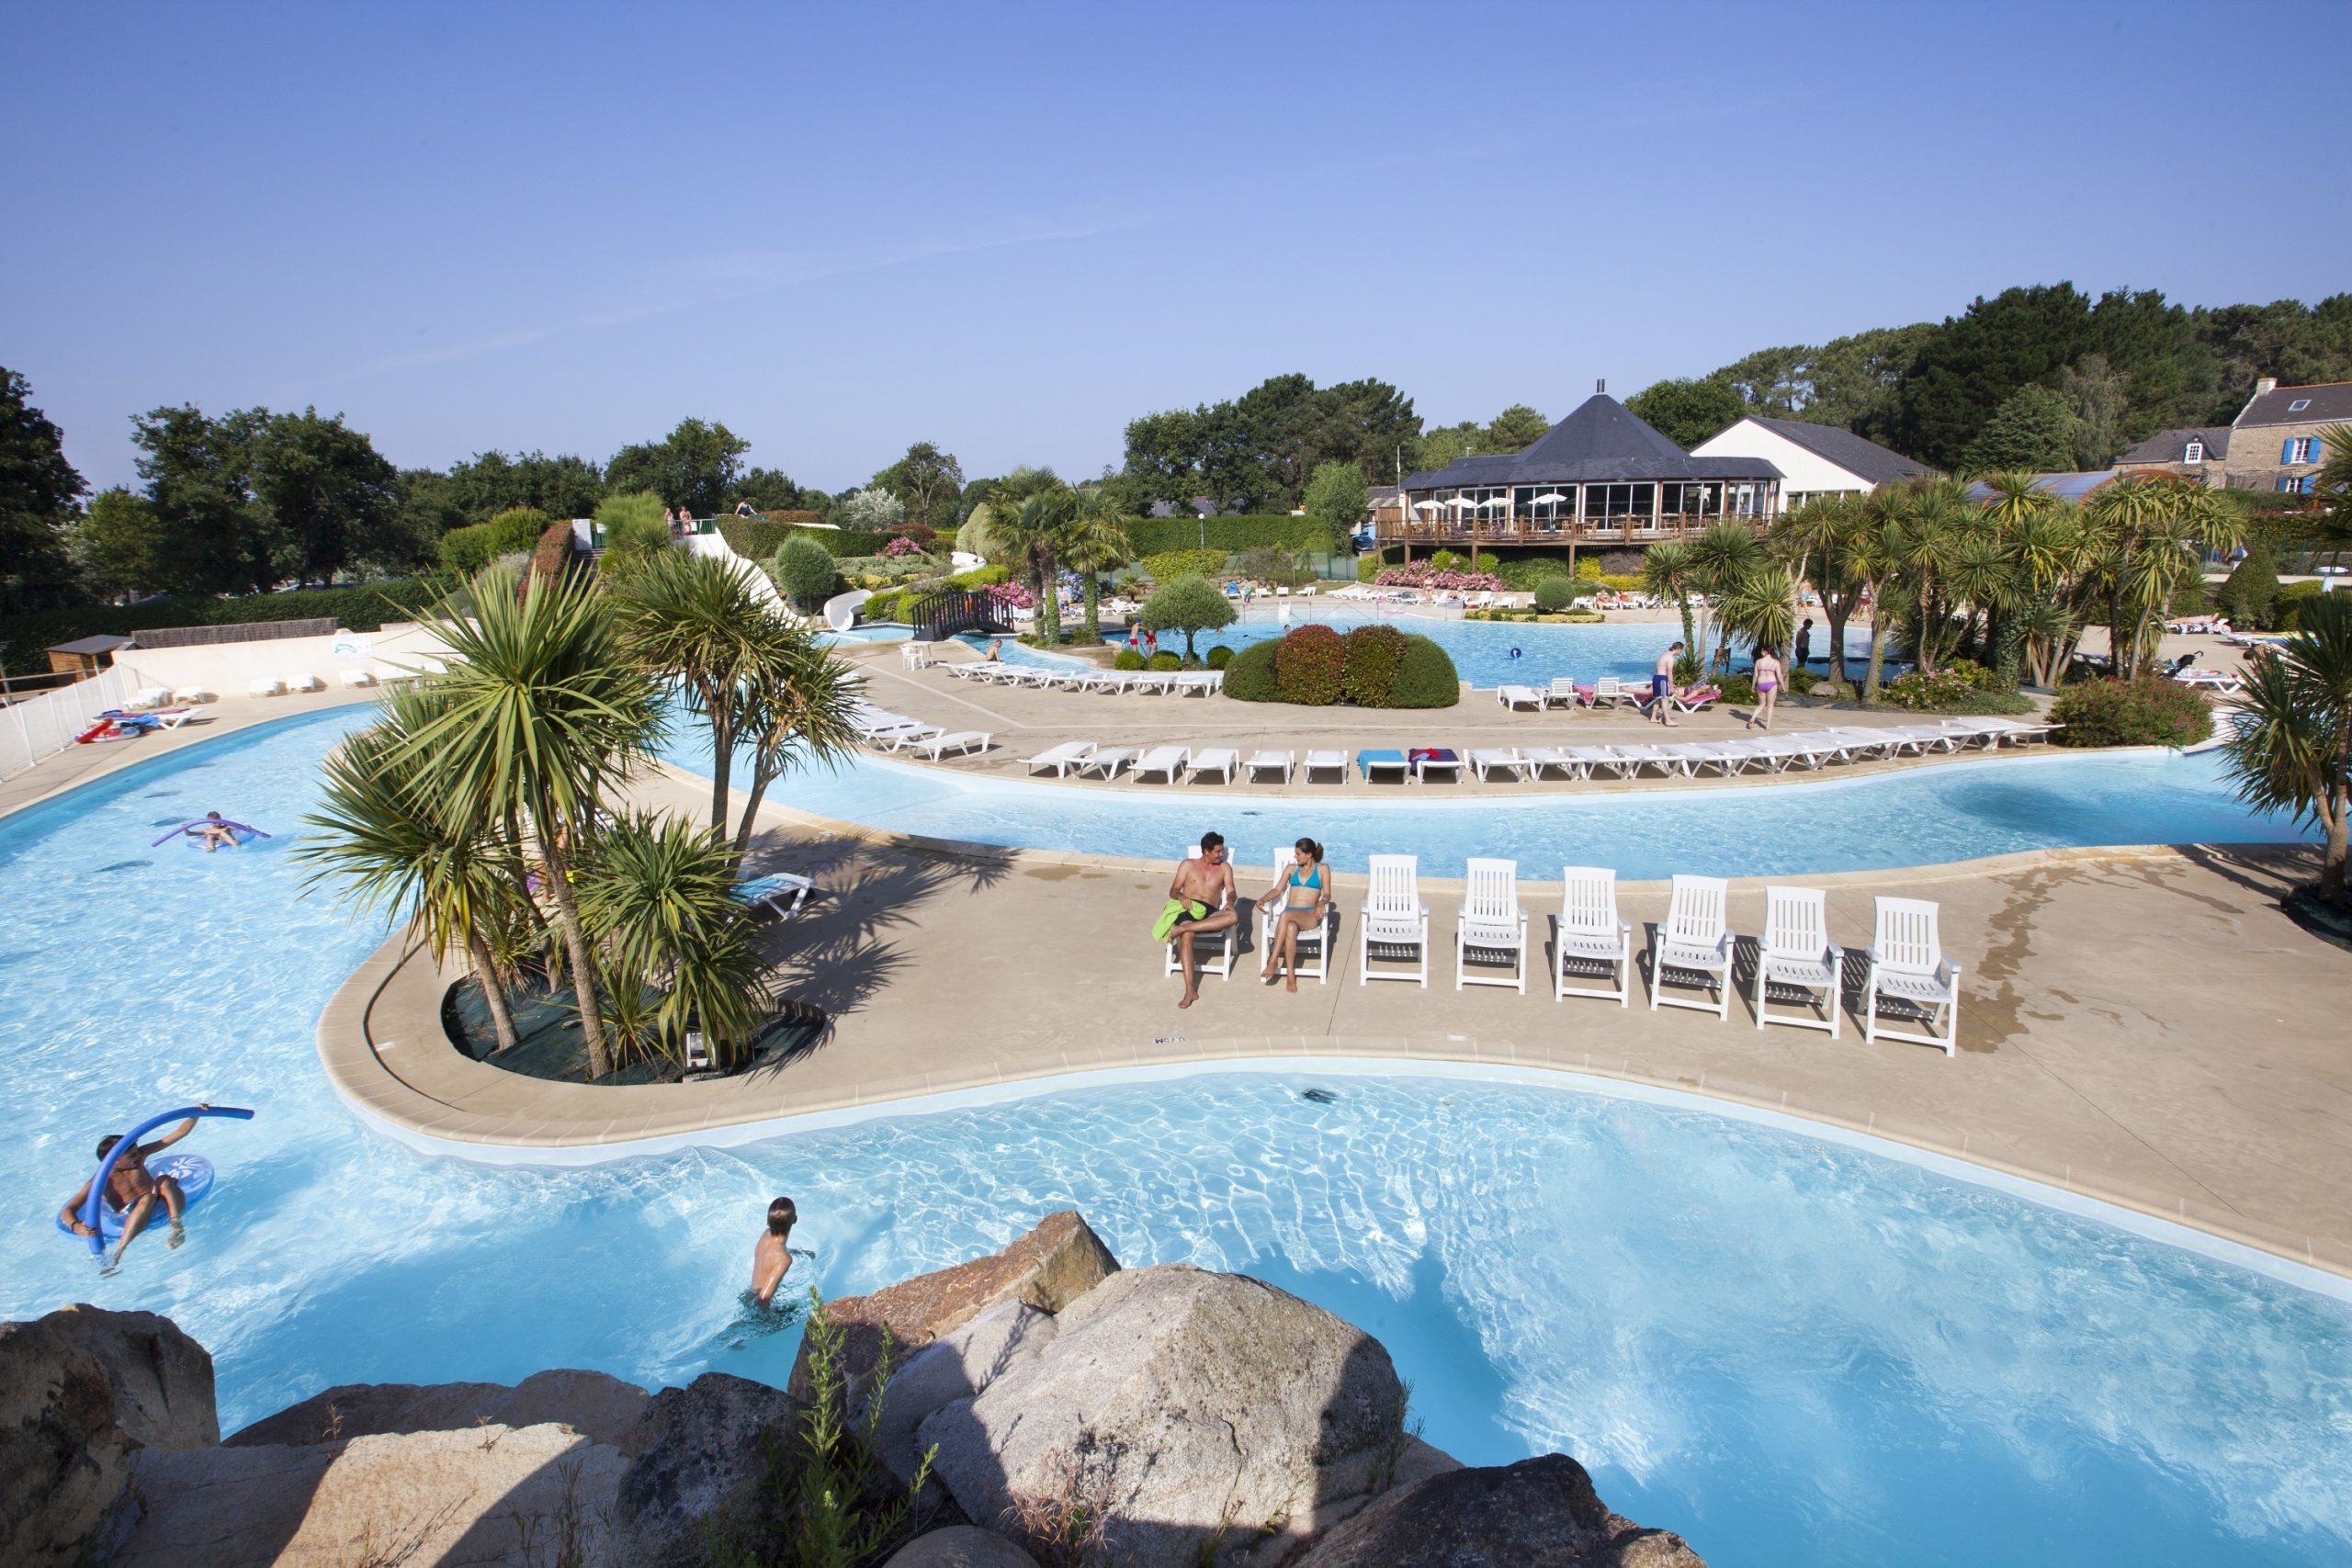 Camping Dans Le Golfe Du Morbihan : Les Bonnes Adresses ... tout Camping Golf Du Morbihan Avec Piscine